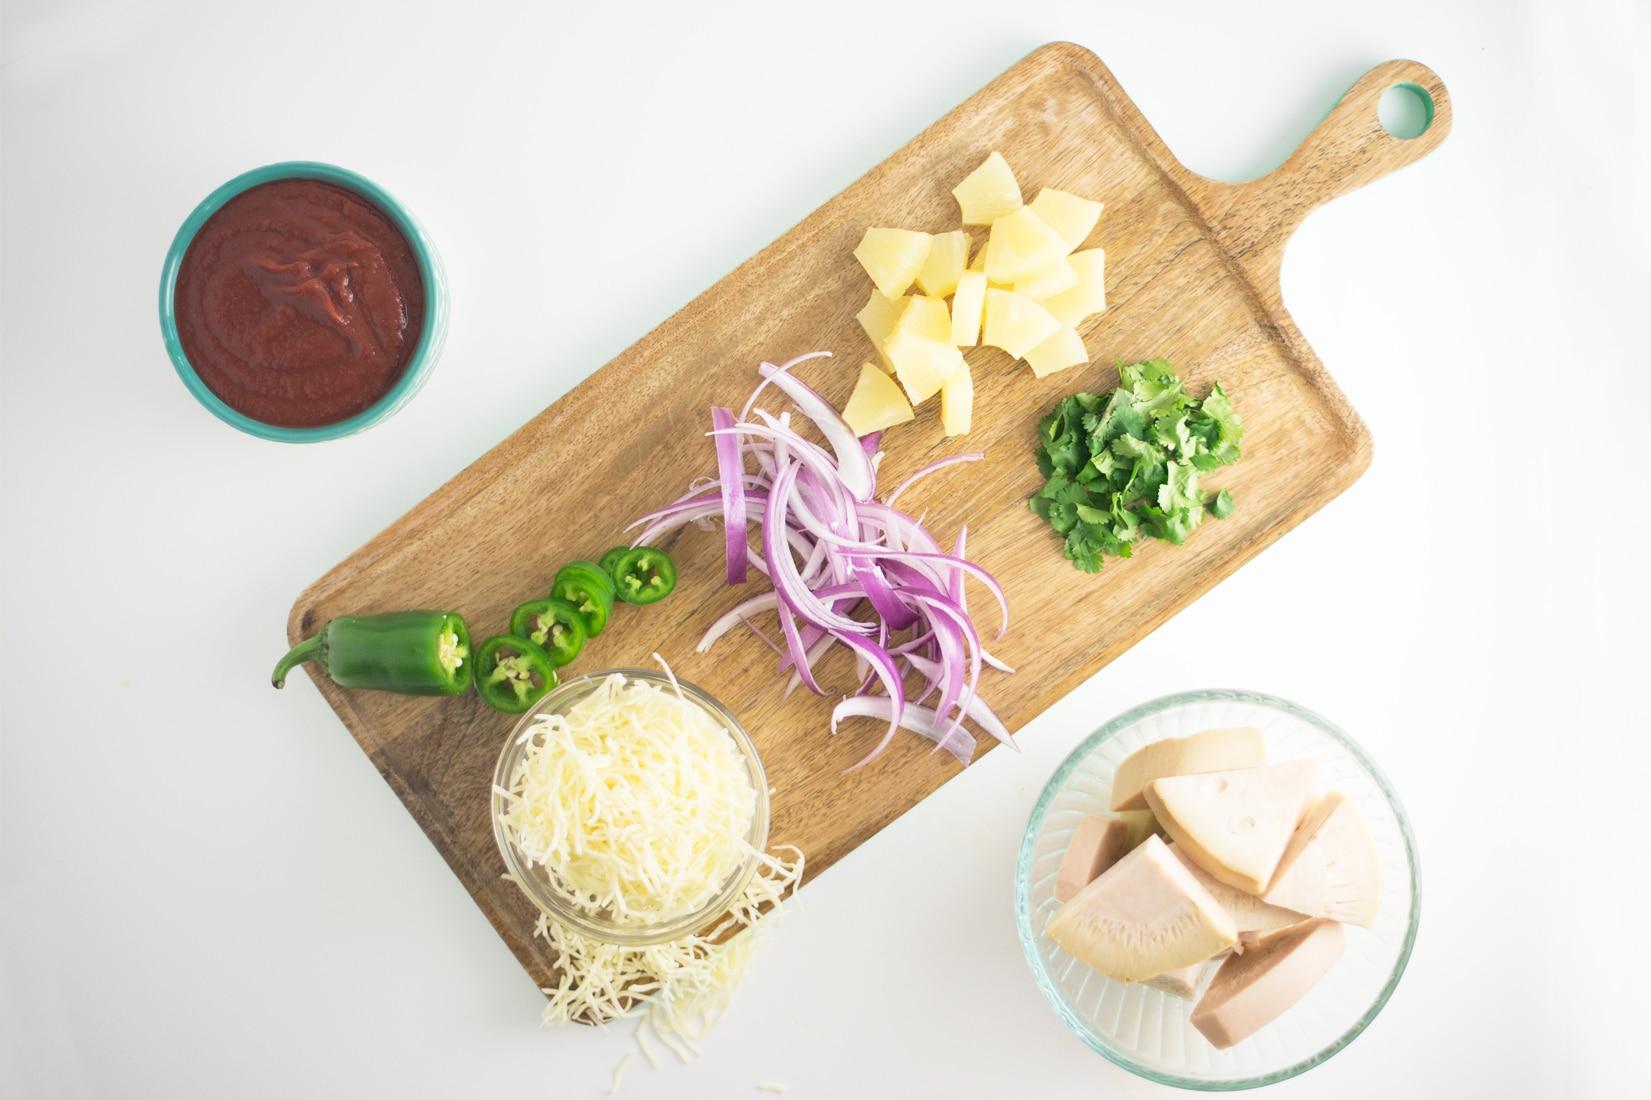 BBQ sauce, jackfruit, jalapenos, pineapple, red onion, cilantro on wooden board